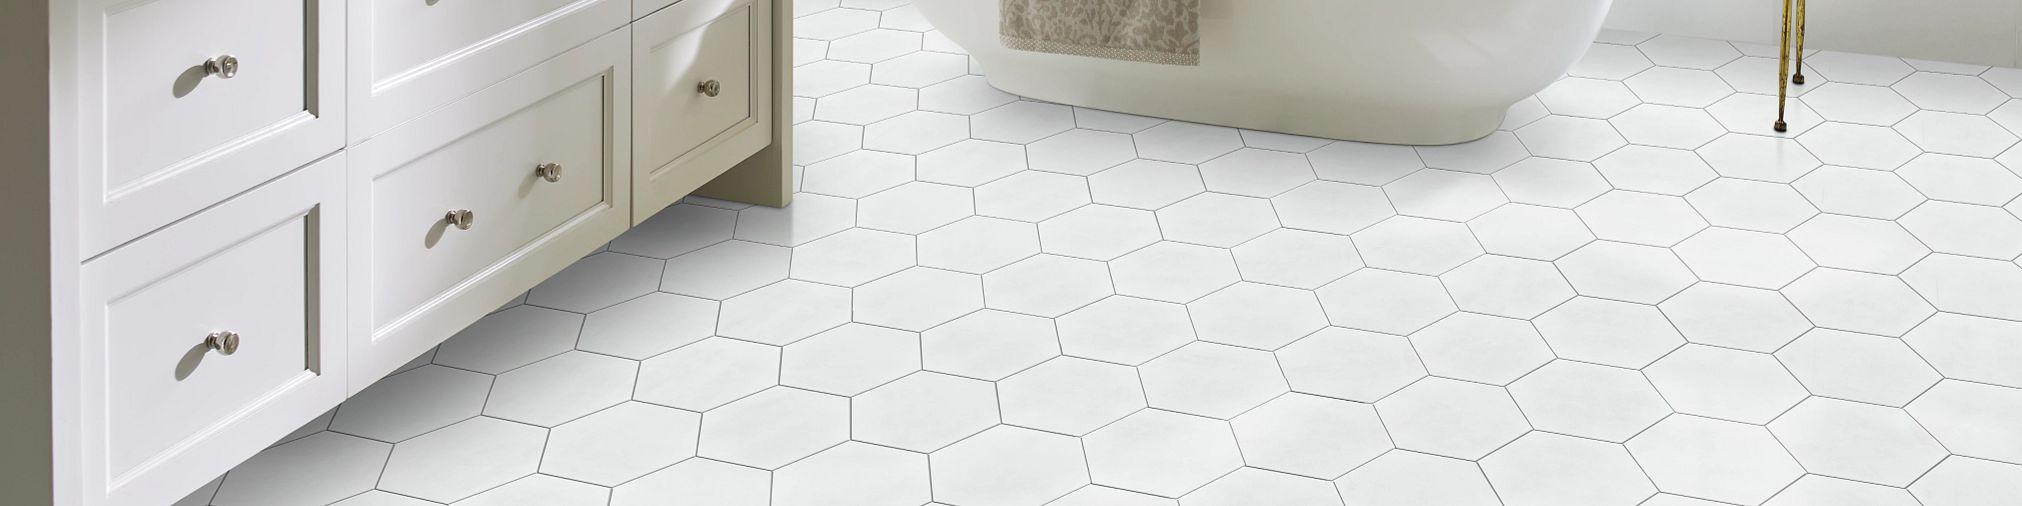 tile and stone flooring in salt lake